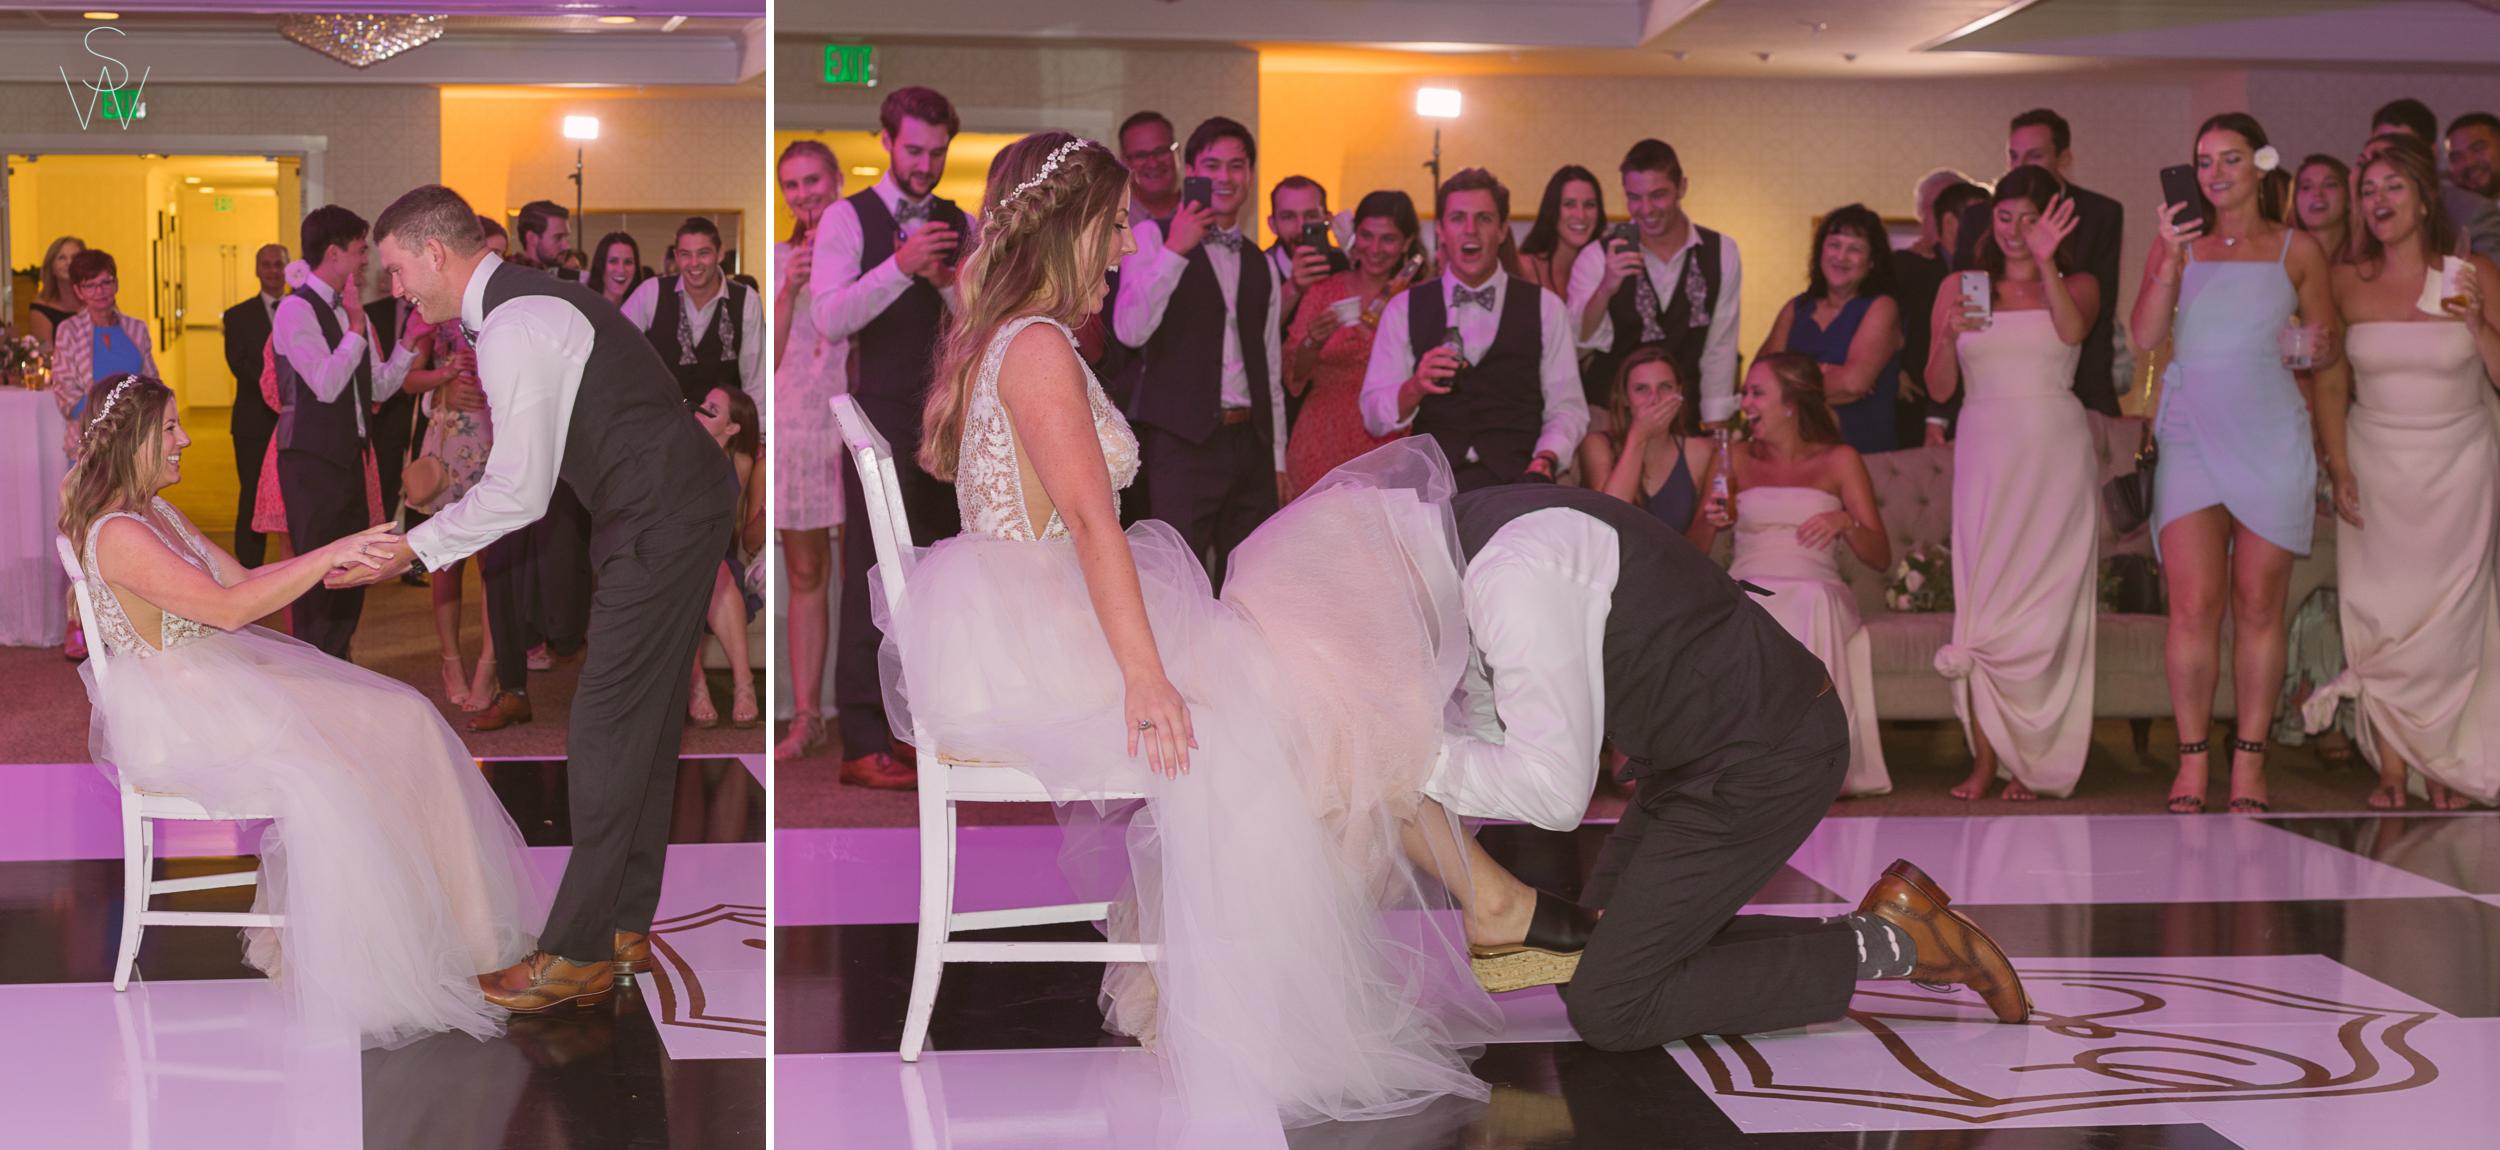 237Lauberge.shewanders.wedding.photography.JPG